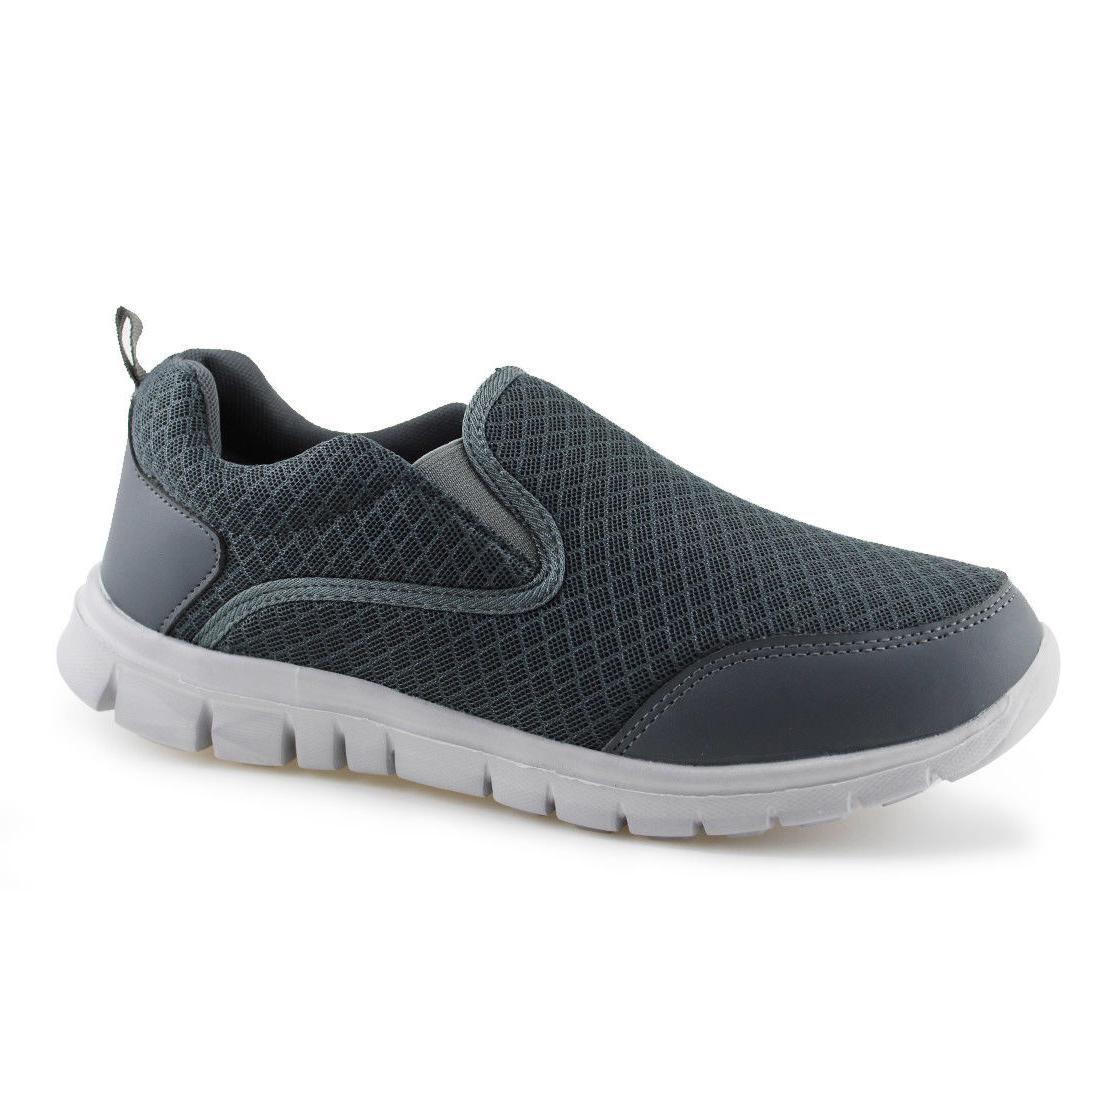 Men's Casual Shoes Slip-On Comfort Loafer Mesh